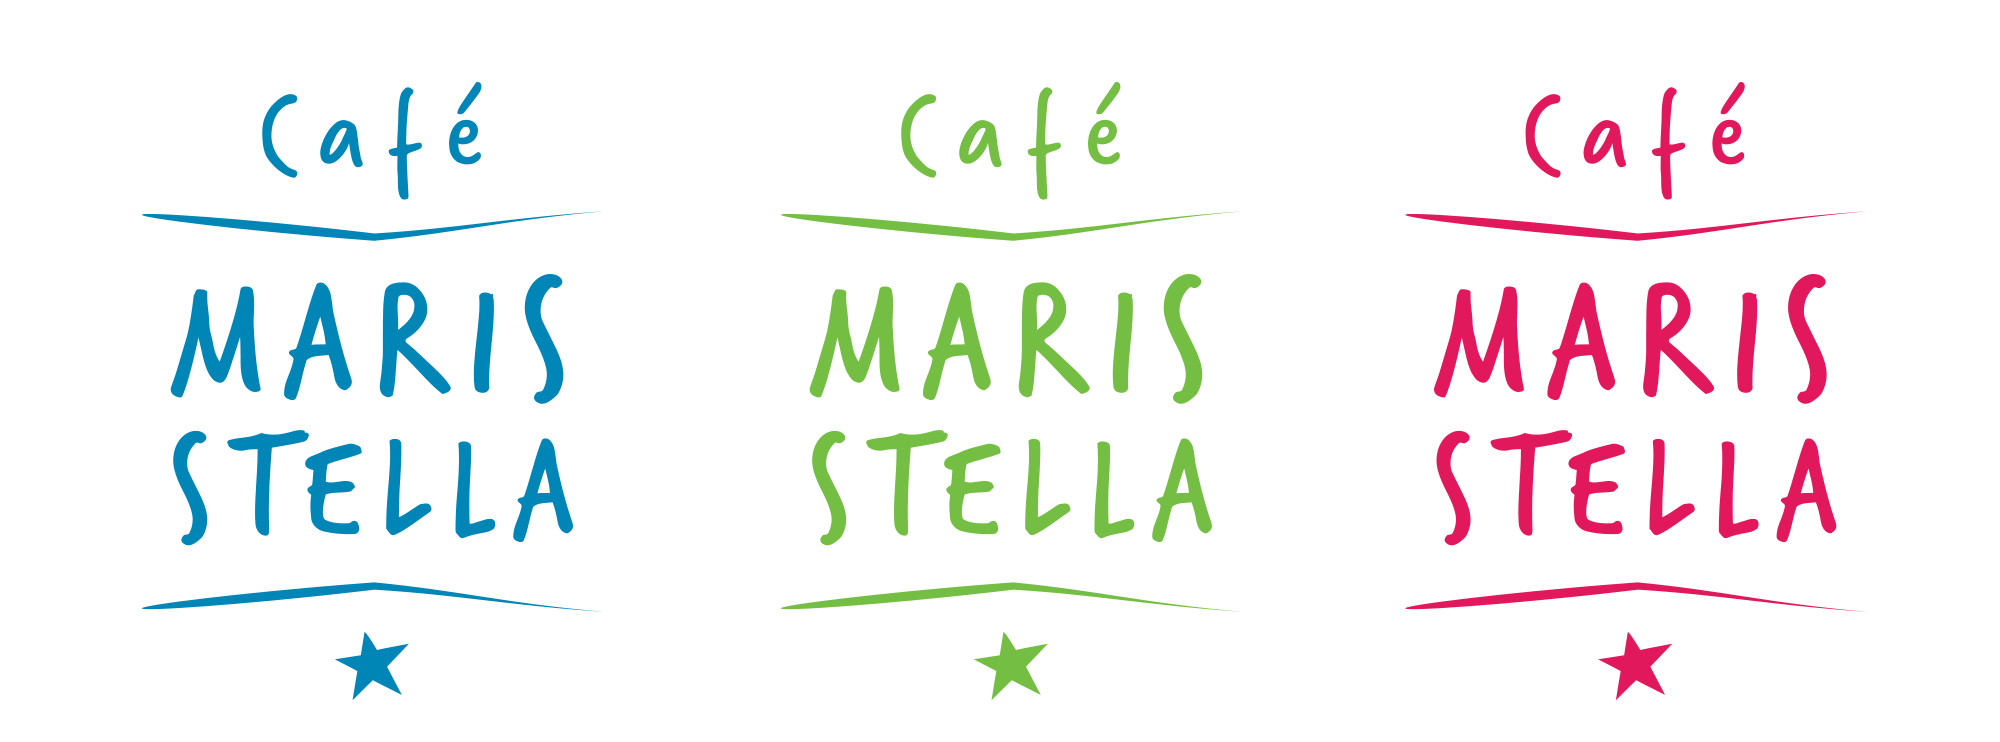 CafeMarisStella.png